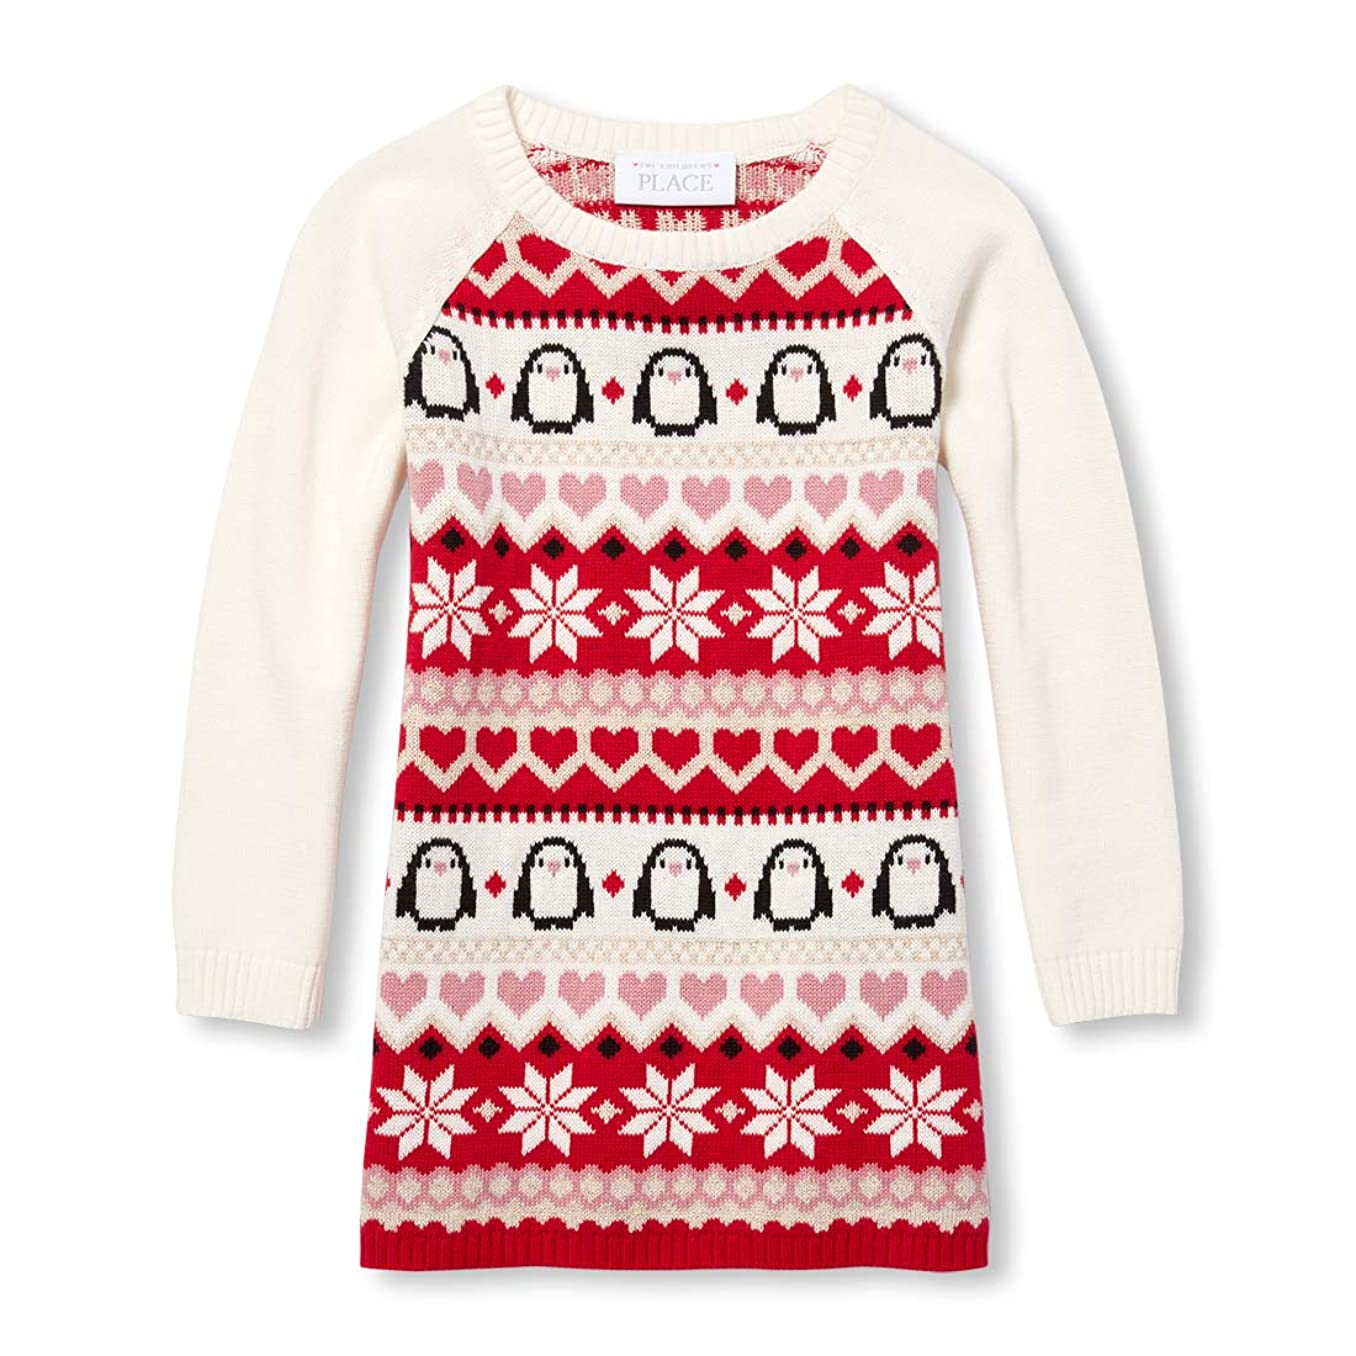 The Children's Place Big Girls' Long Sleeve Sweater Dress